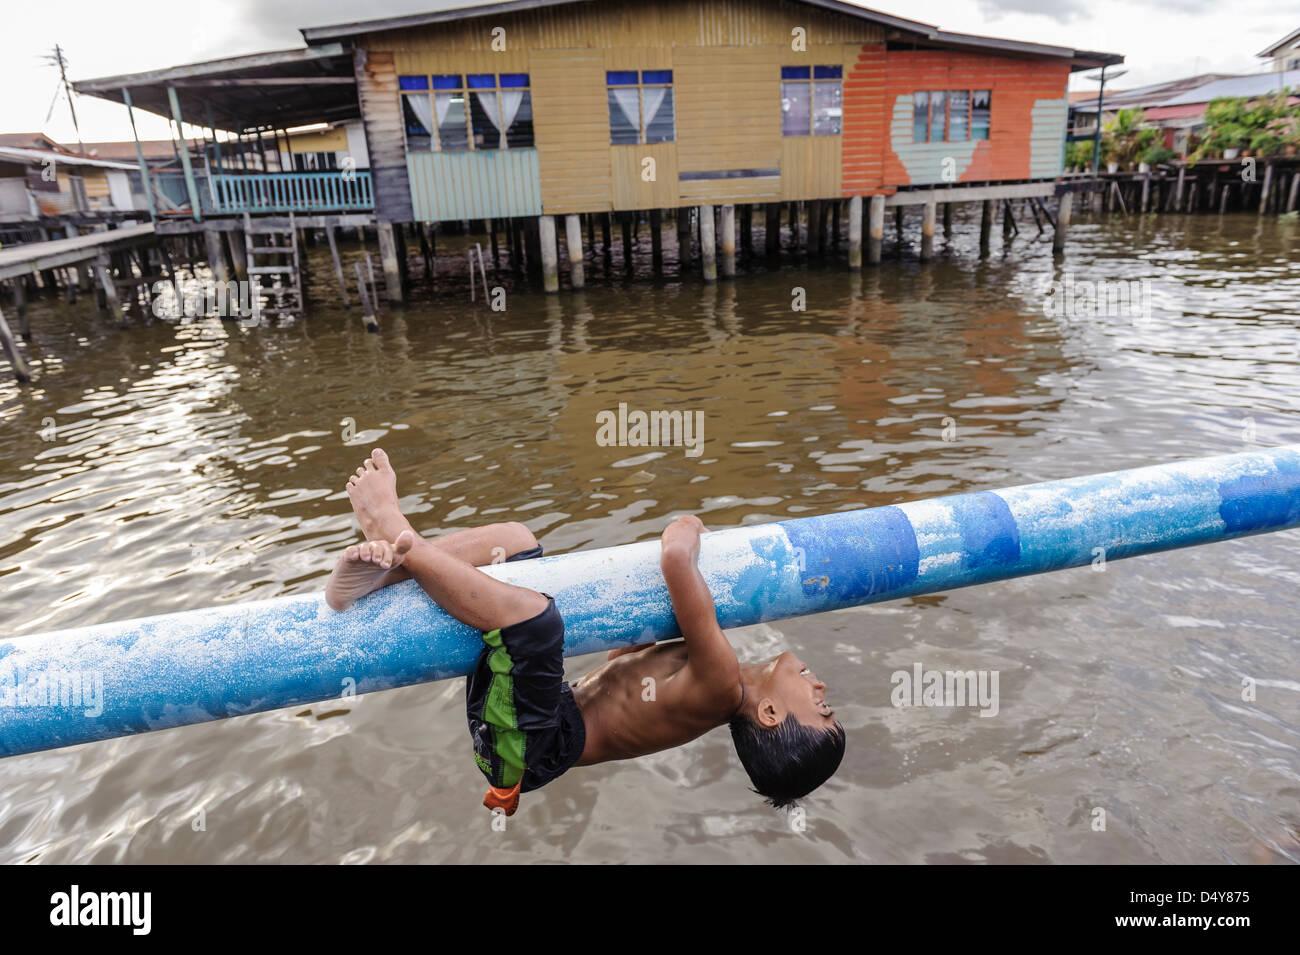 Boy playing and swimming, Kampung Ayer neighbourhood, Bandar Seri Bengawan, Brunei, Asia - Stock Image